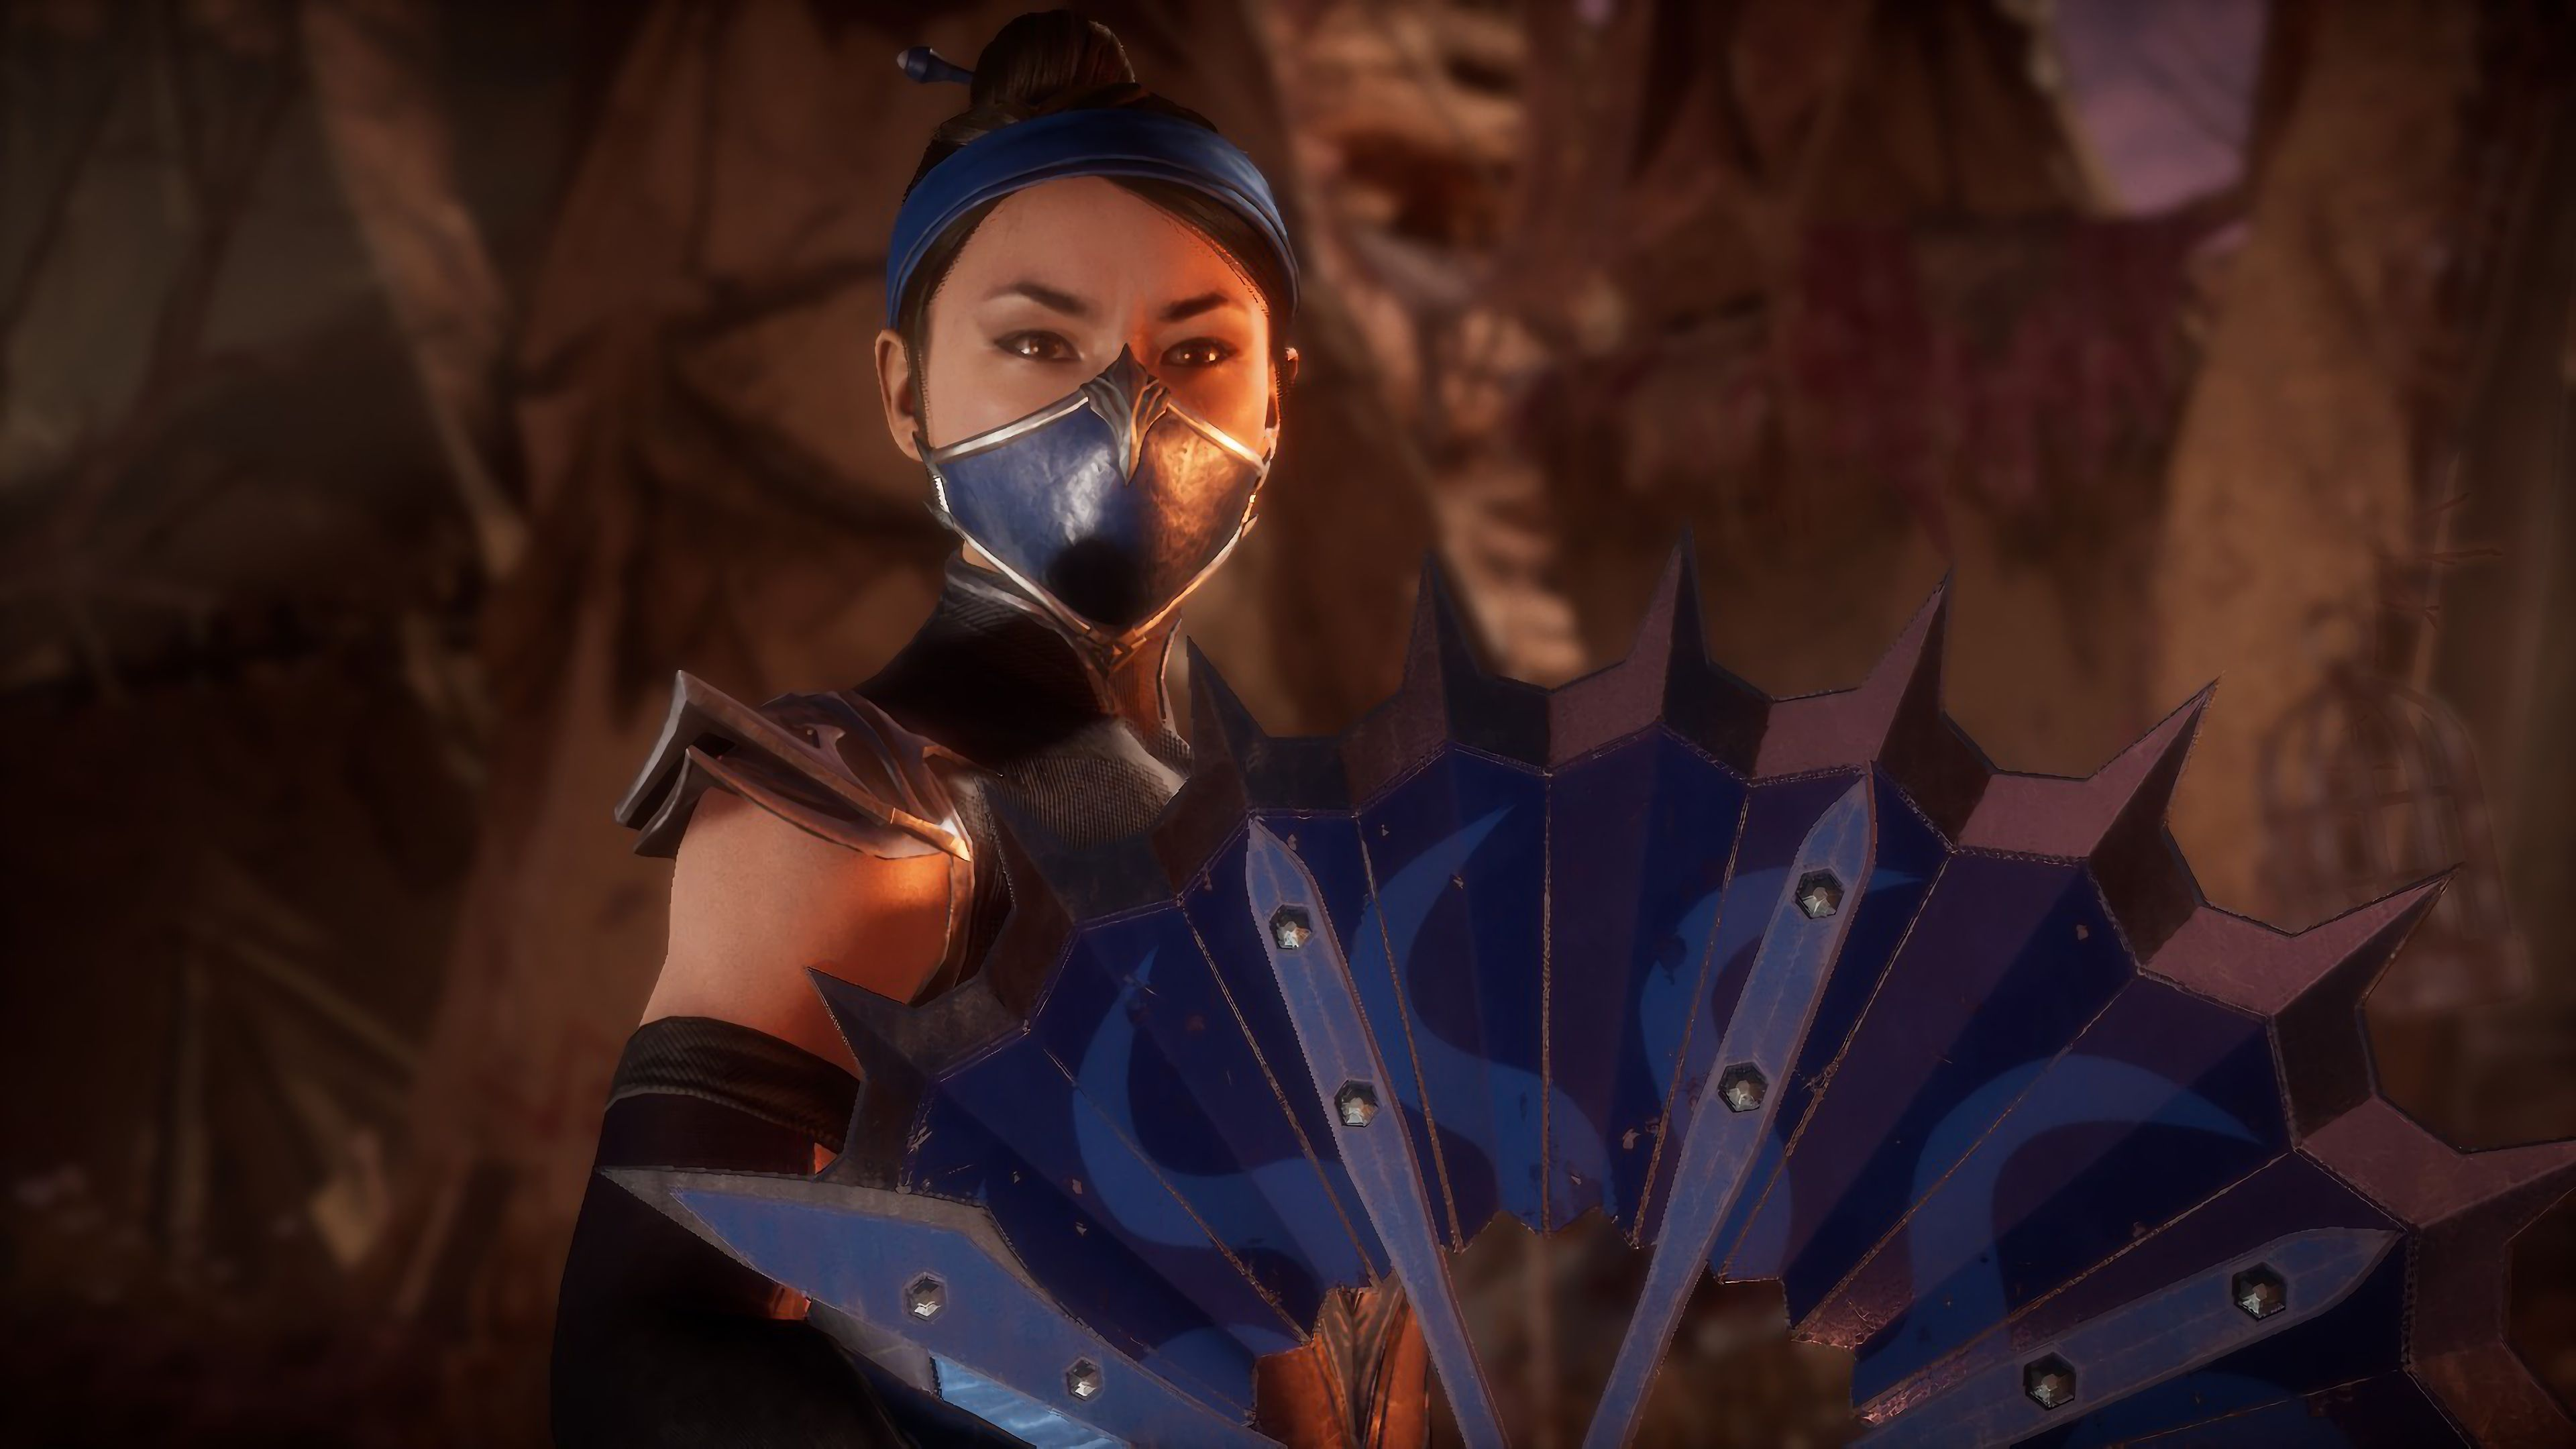 Kitana Mortal Kombat Wallpapers Wallpaper Cave